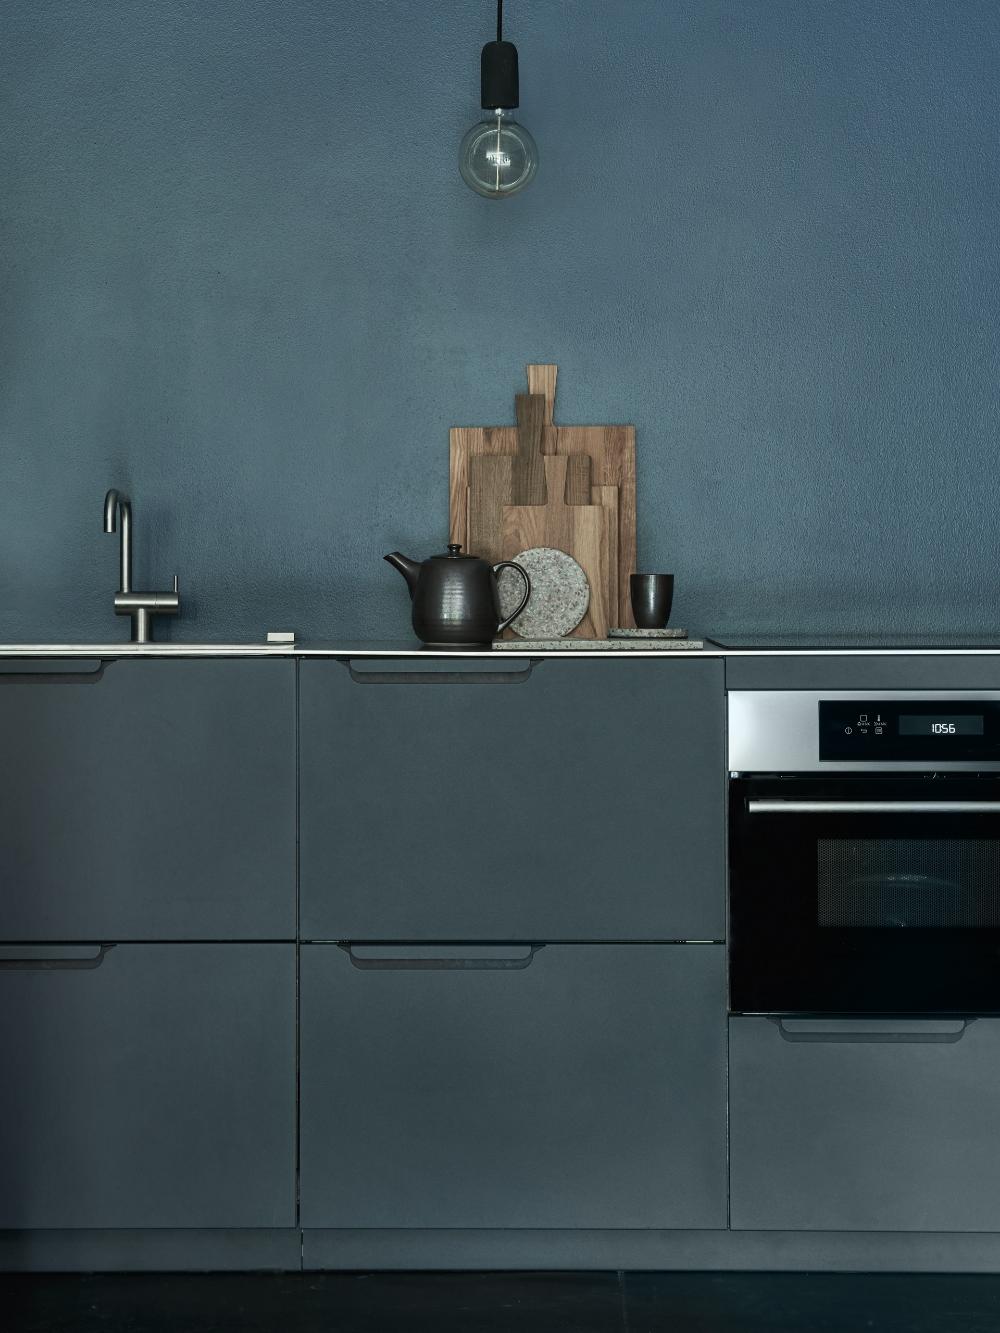 Reform Fold Kitchen Google Search Moderne Kuchenideen Kuchen Design Ikea Kuchenideen